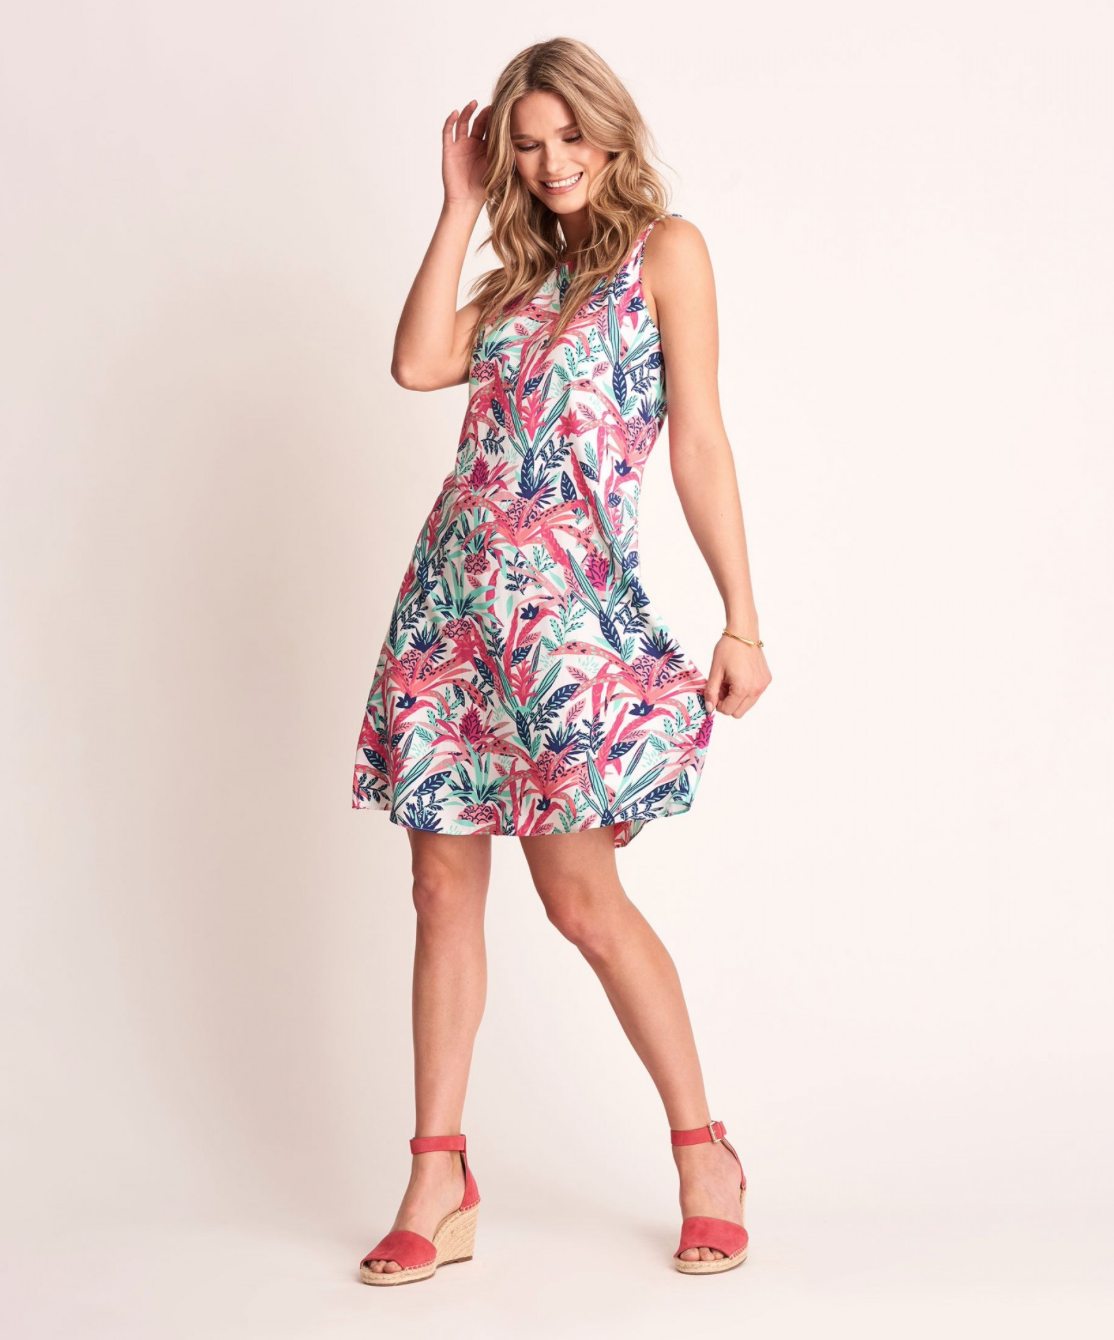 Pineapple Meghan Dress